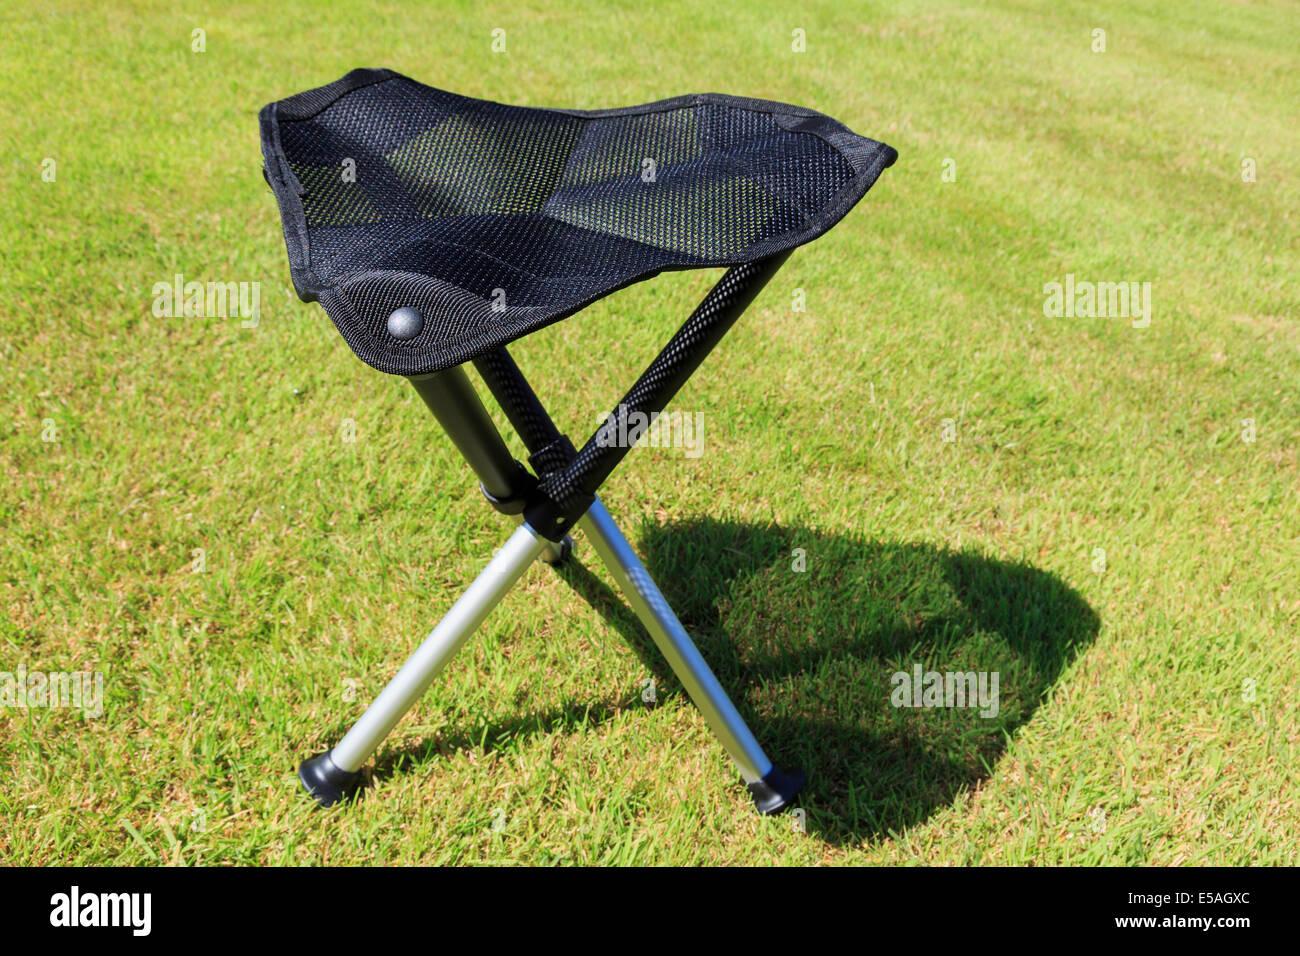 Folding Portable Three Legged Tripod Camping Stool With A Triangular Mesh  Seat On Grass In Sunshine